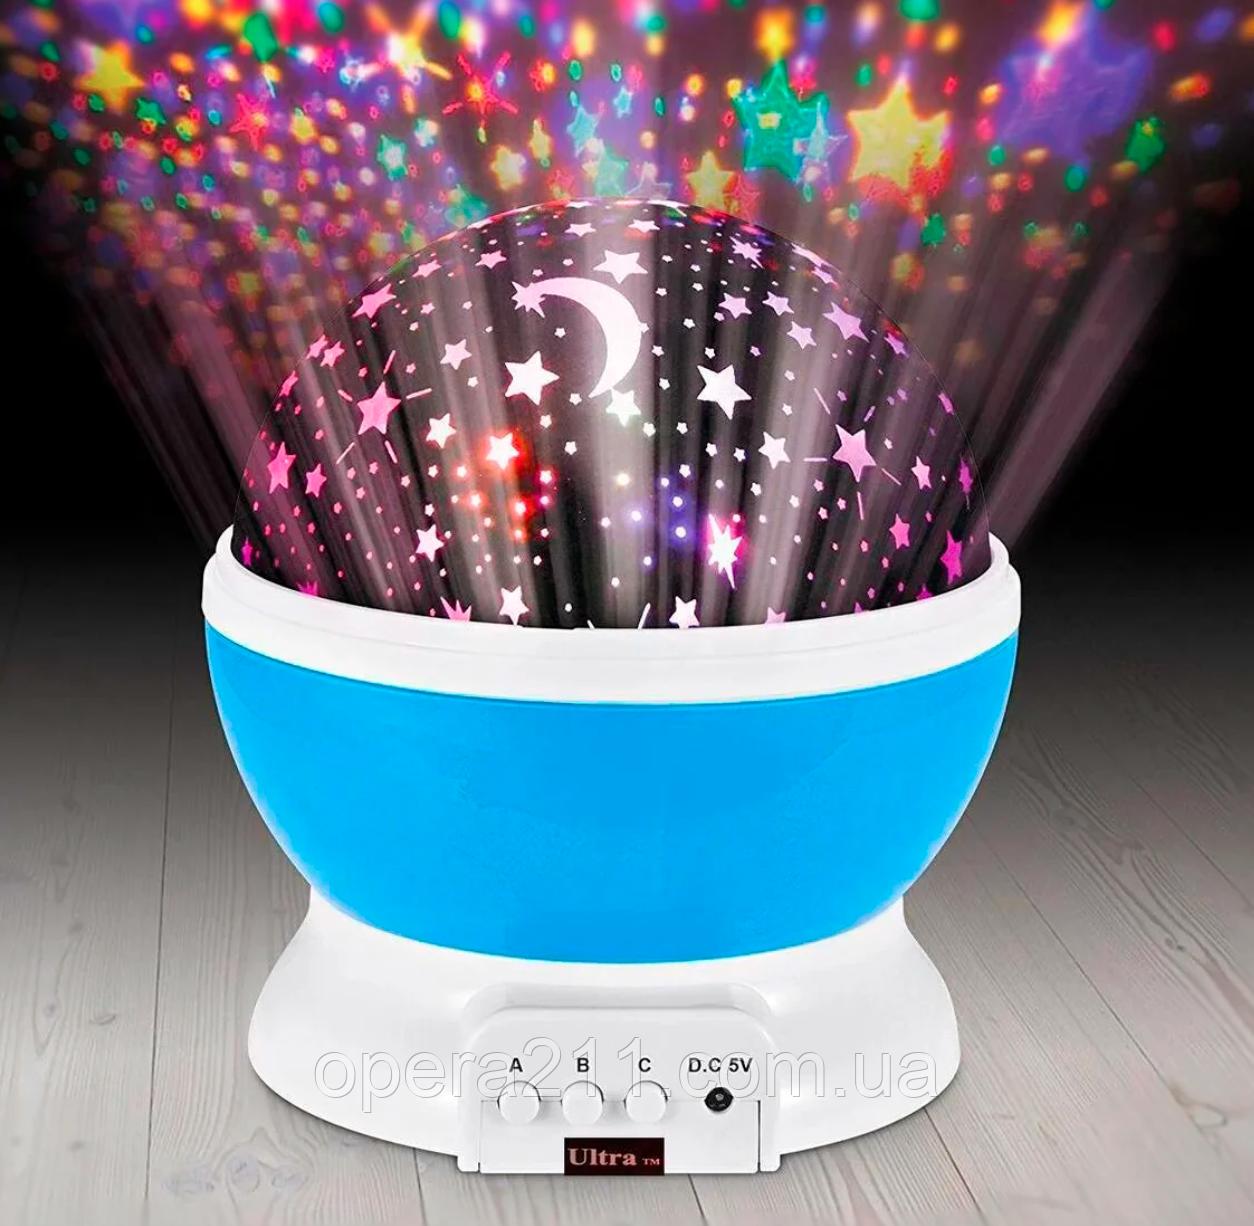 Новогодний свет -- Ночник проектор звездного неба Star Master Dream / ART-0314 (48шт)